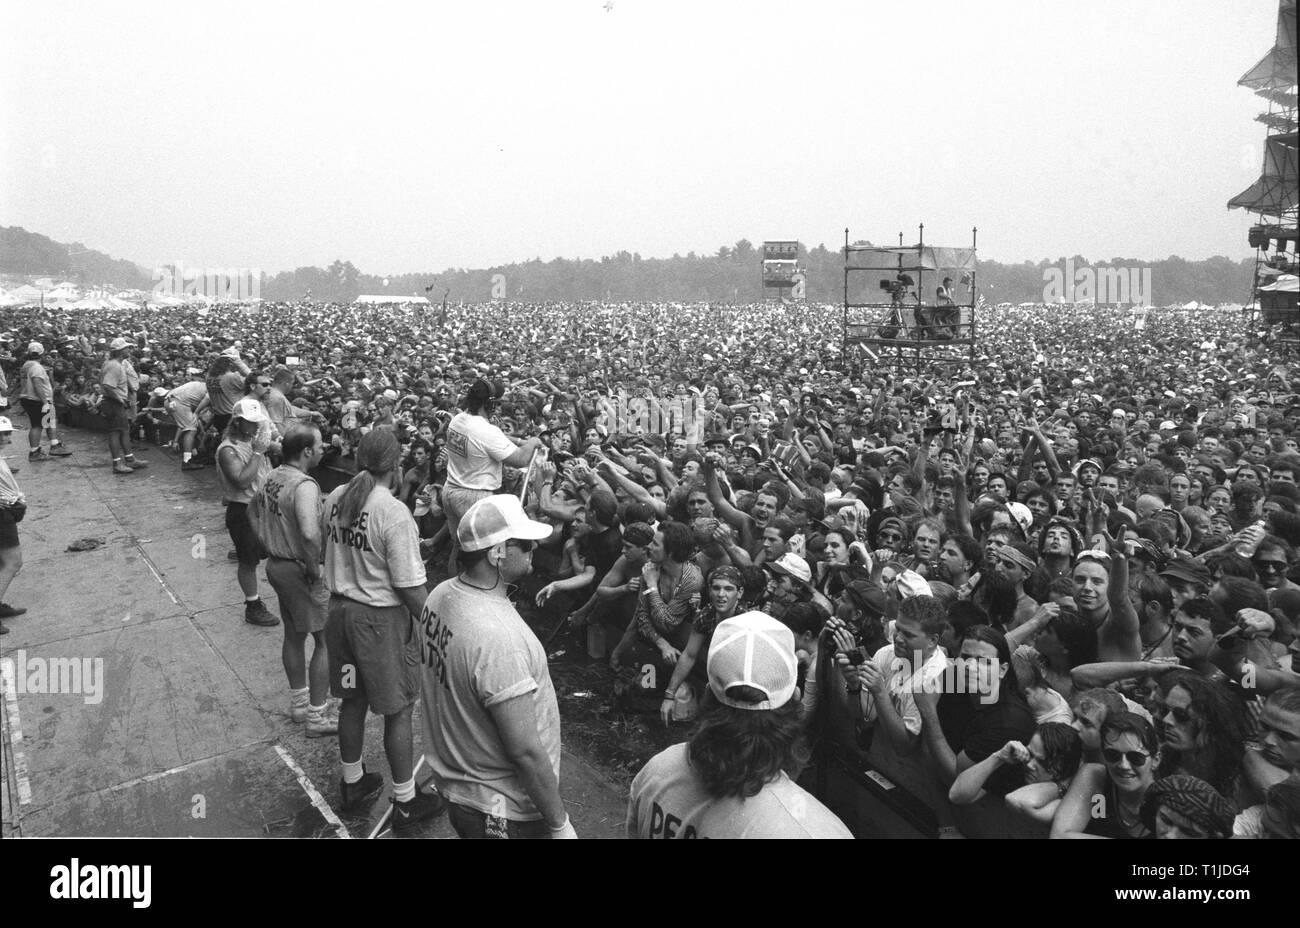 Woodstock 94 Stock Photos & Woodstock 94 Stock Images - Alamy